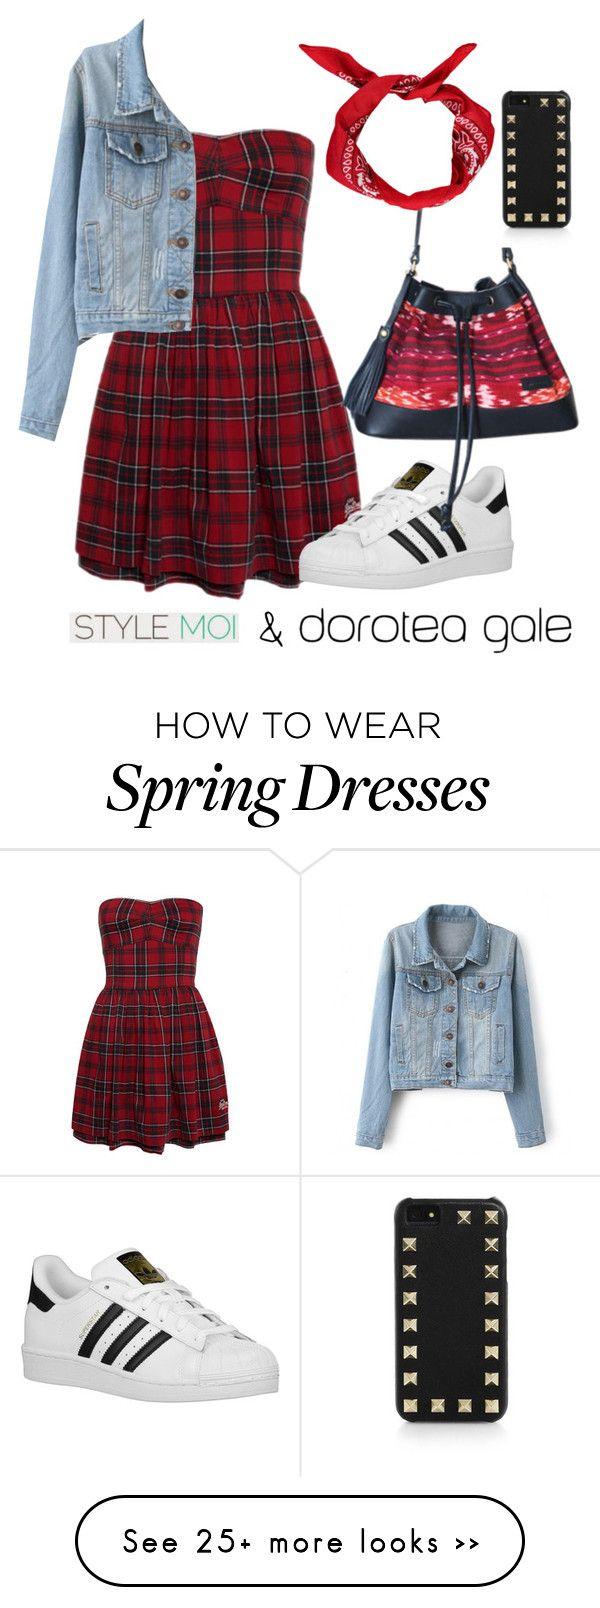 """Style moi"" by doroteagale on Polyvore featuring moda, adidas Originals e Valentino"